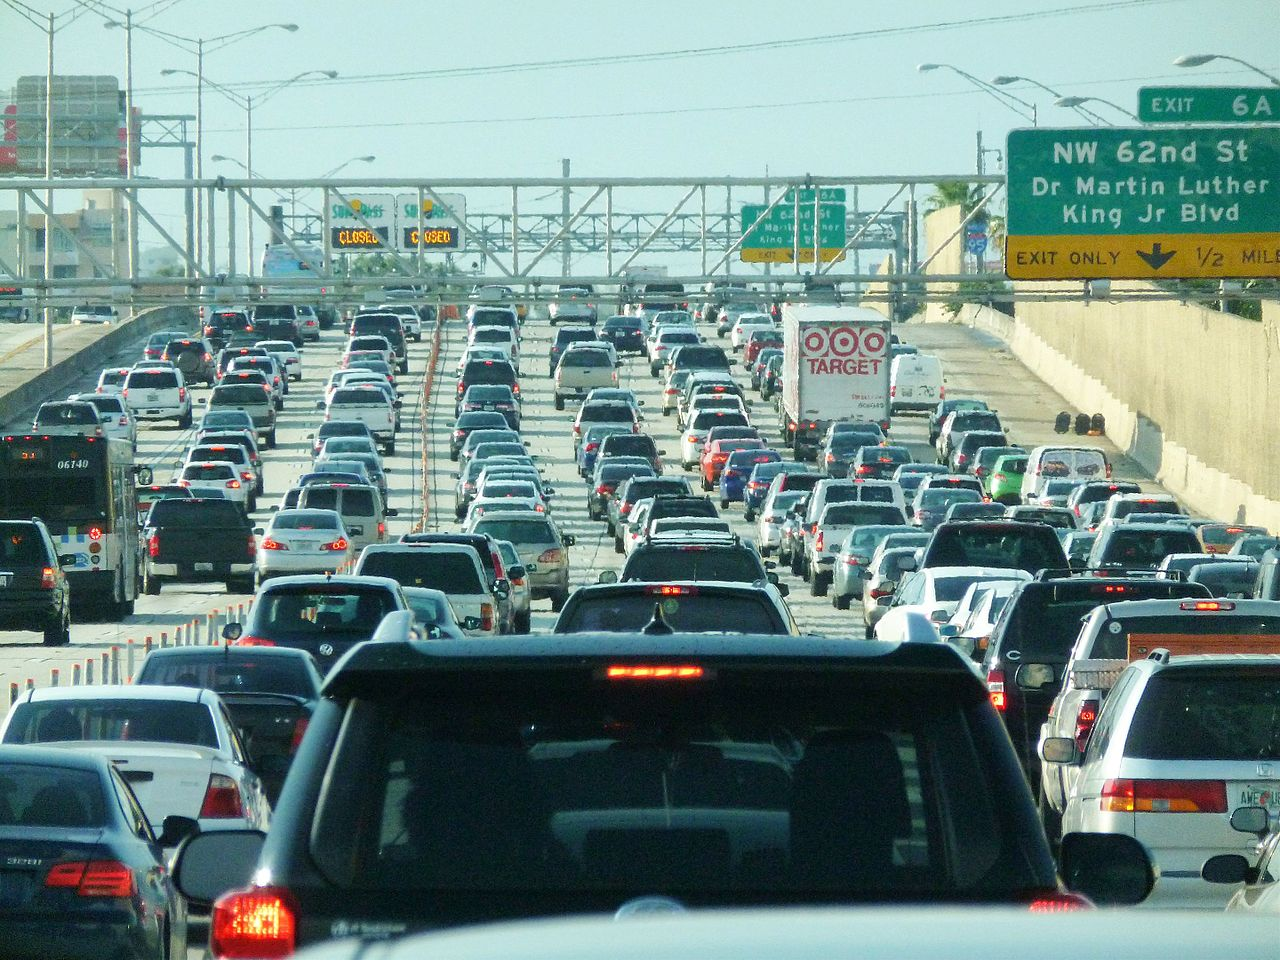 Interstate 95 Traffic Jam In Miami